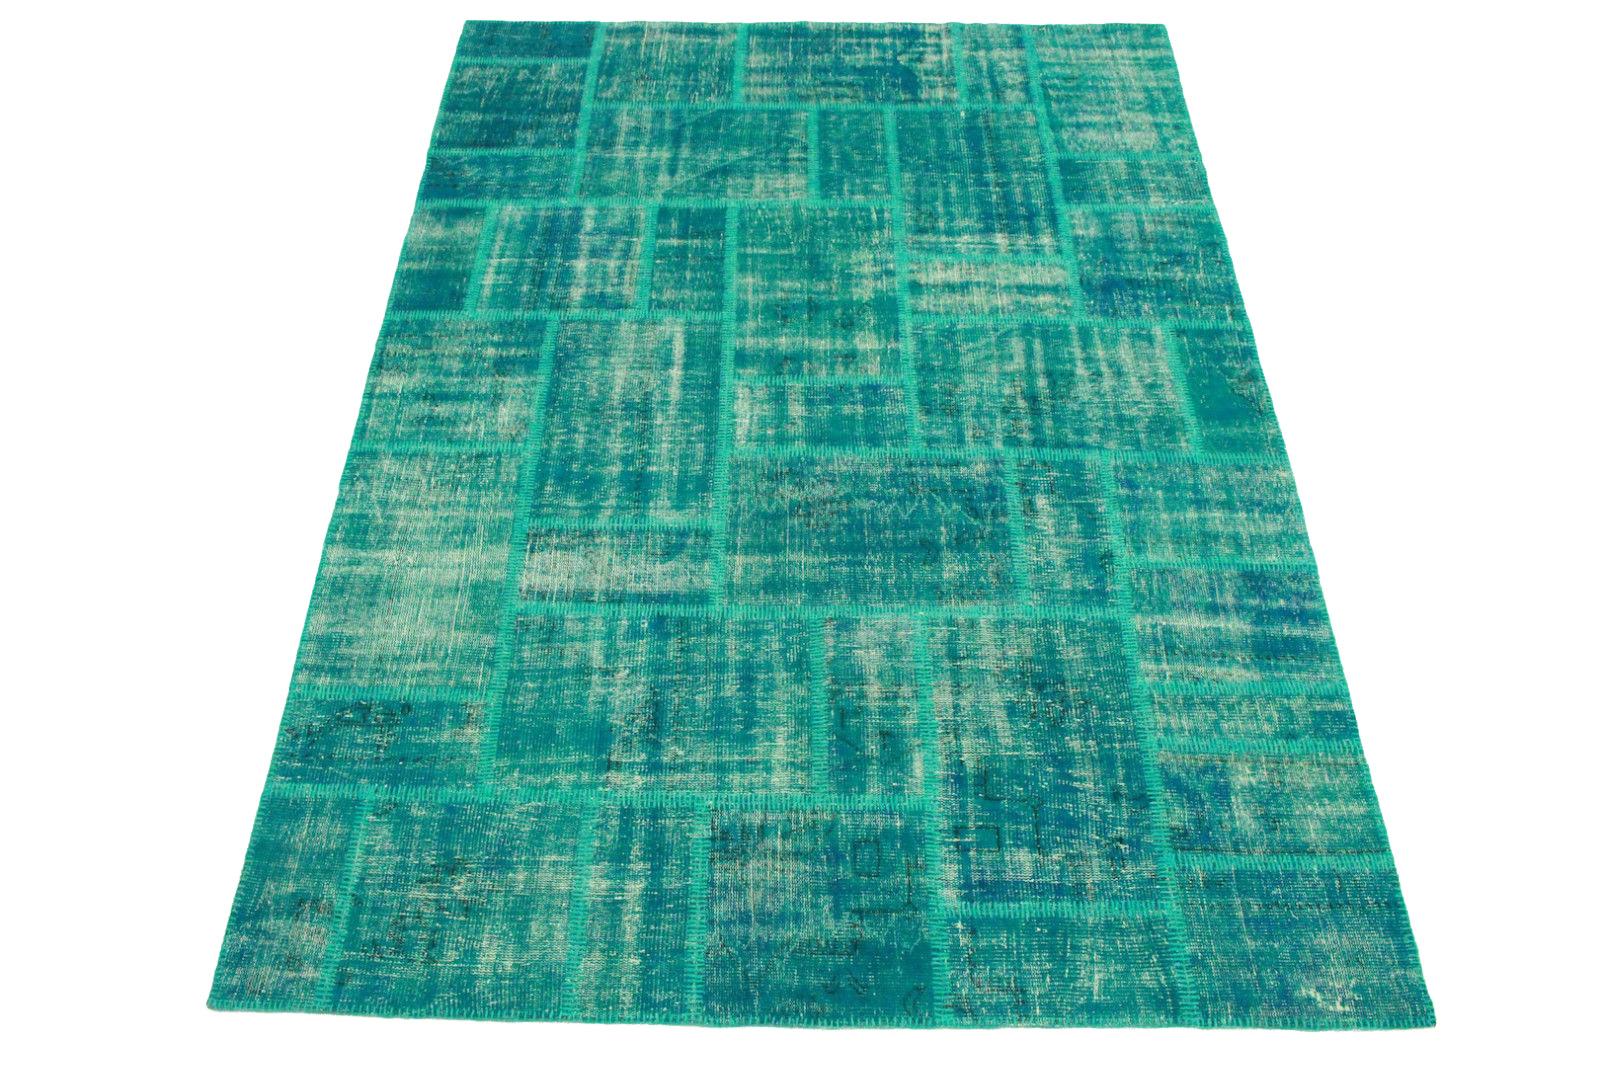 Orientteppich türkis  Moderne Teppiche online bei carpetido.de